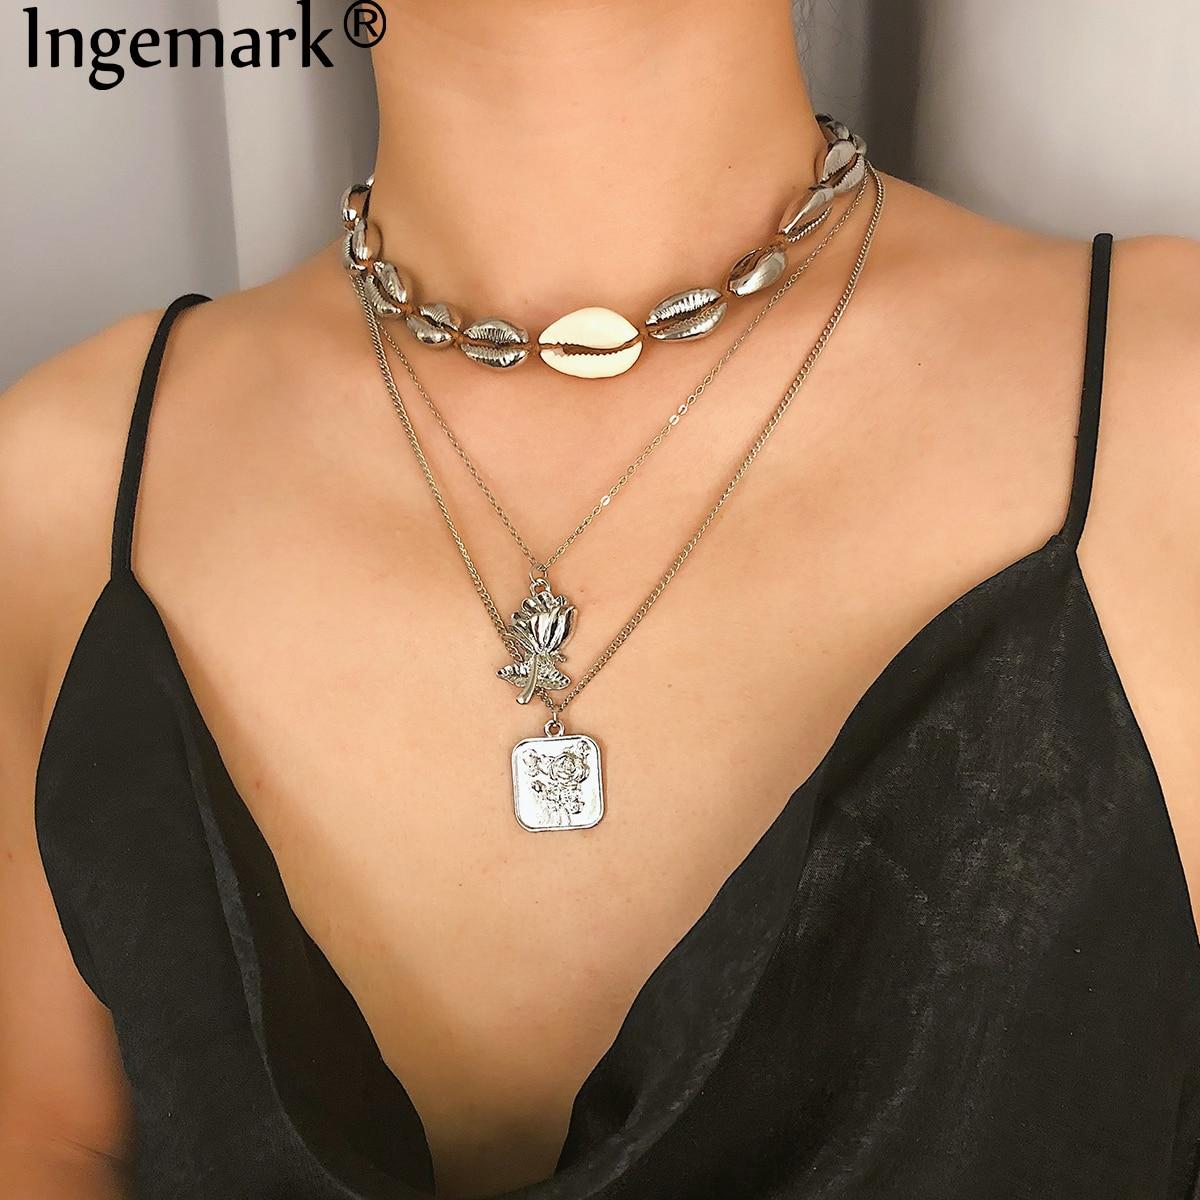 Ingemark Bohemian Beach Shell Choker Necklace Gifts Sweet Ocean Sea Beach Carve Coin Flower Pendant Long Necklace Boho Jewelry